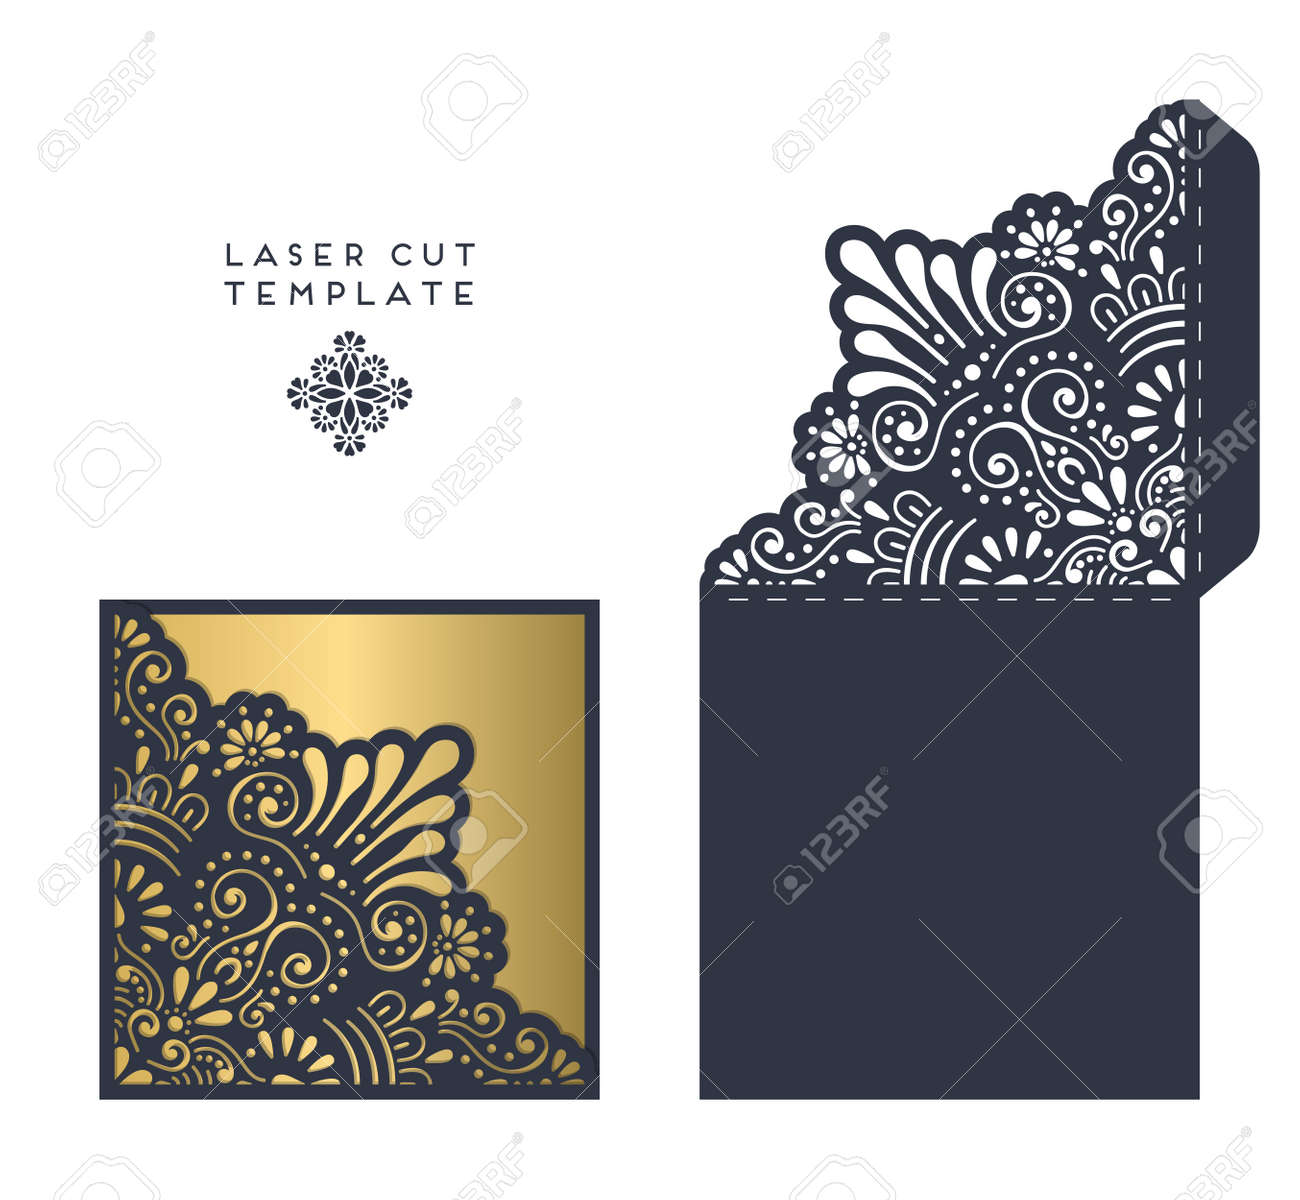 Laser cut template envelope wedding card invitation royalty free laser cut template envelope wedding card invitation stock vector 62297245 stopboris Choice Image